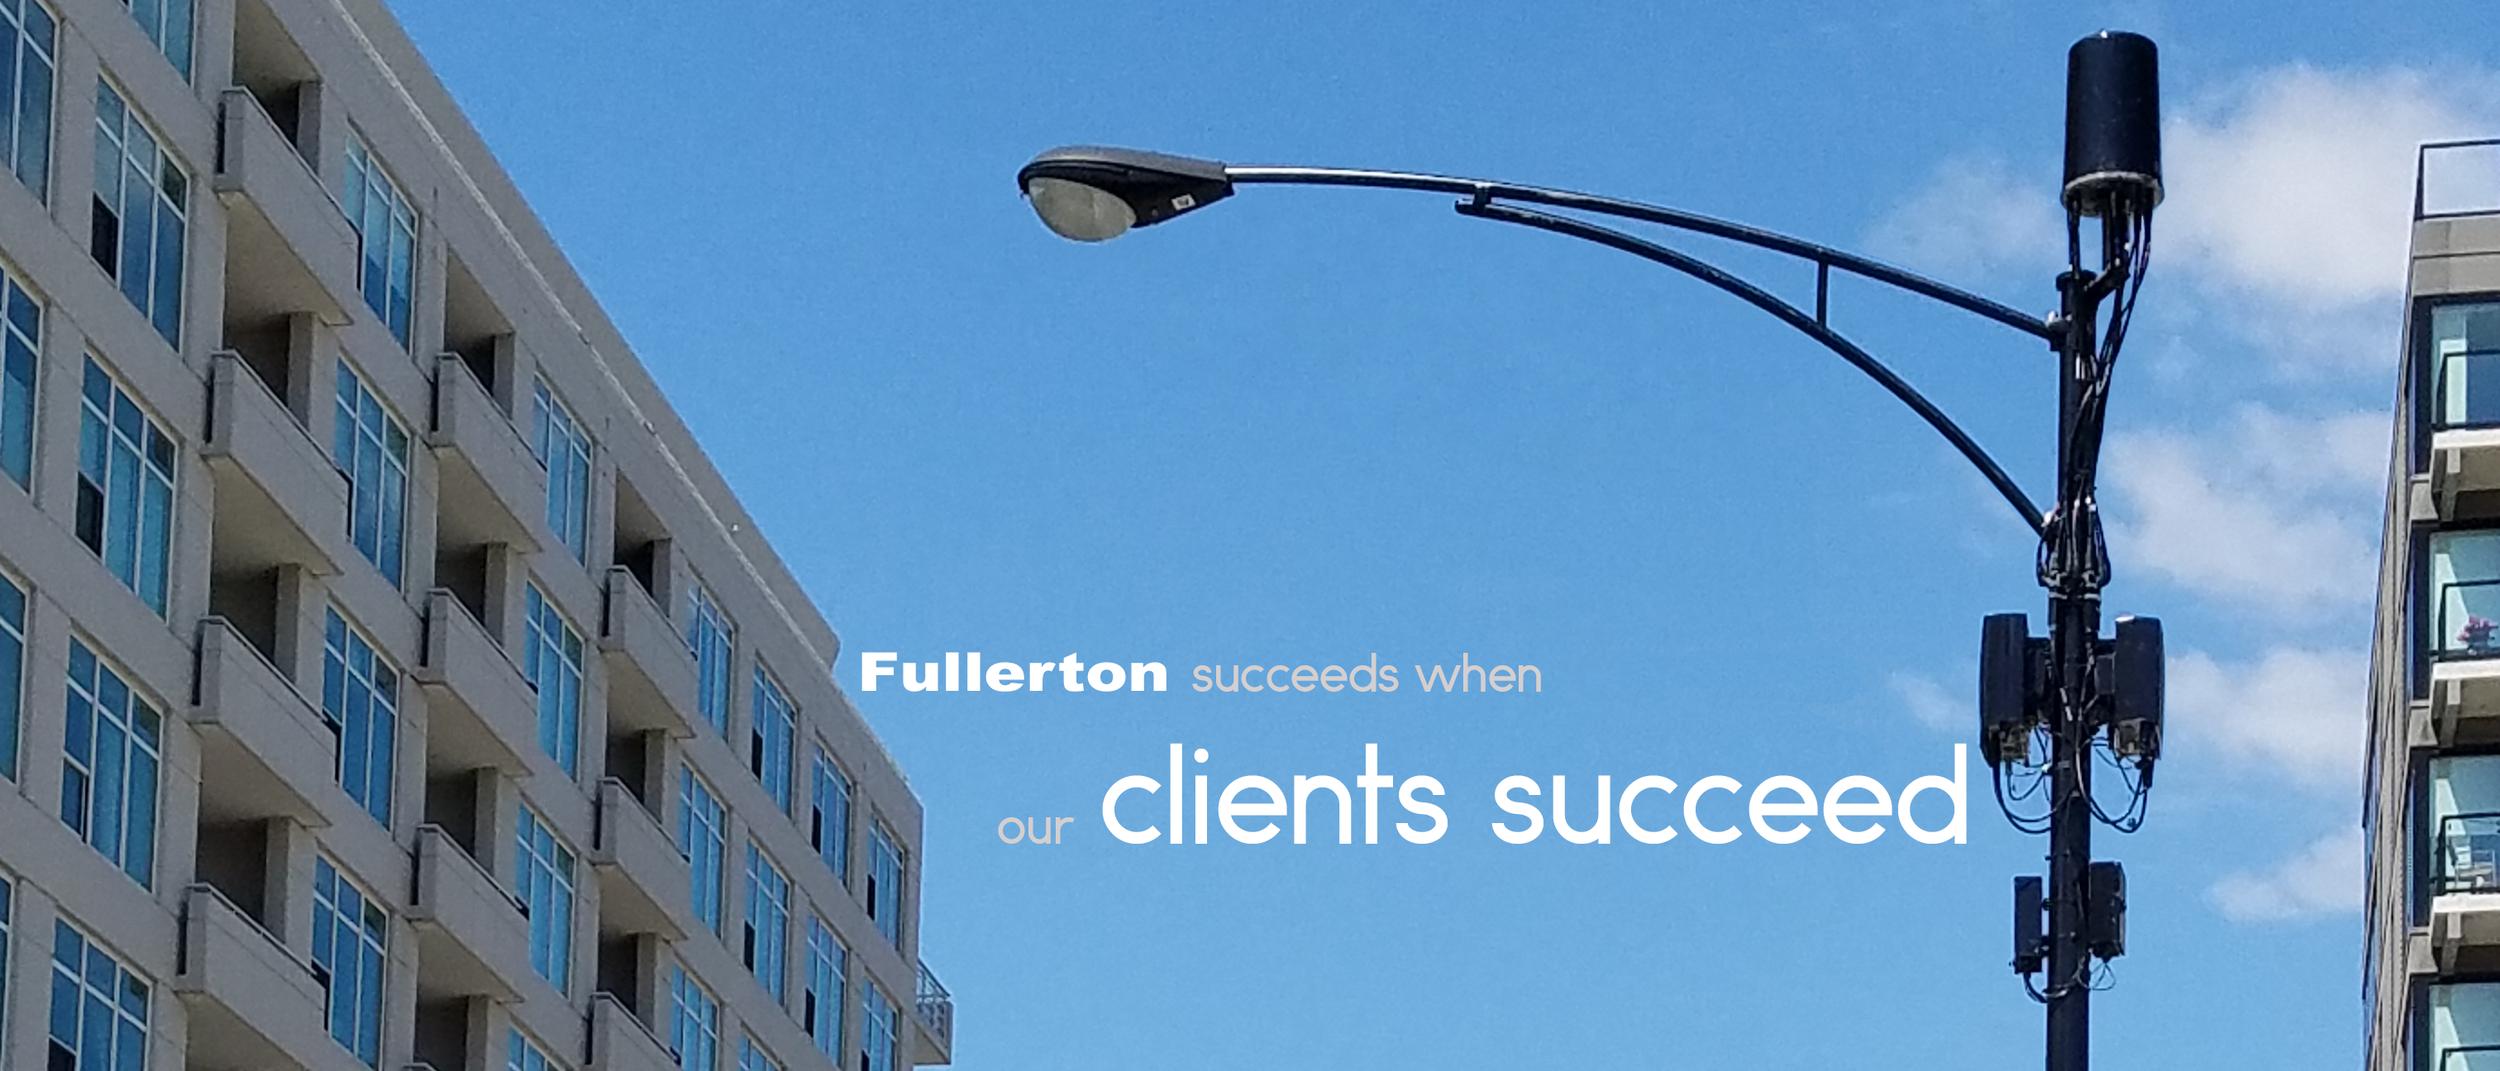 Pole_Building-Fullerton Succeeds.png